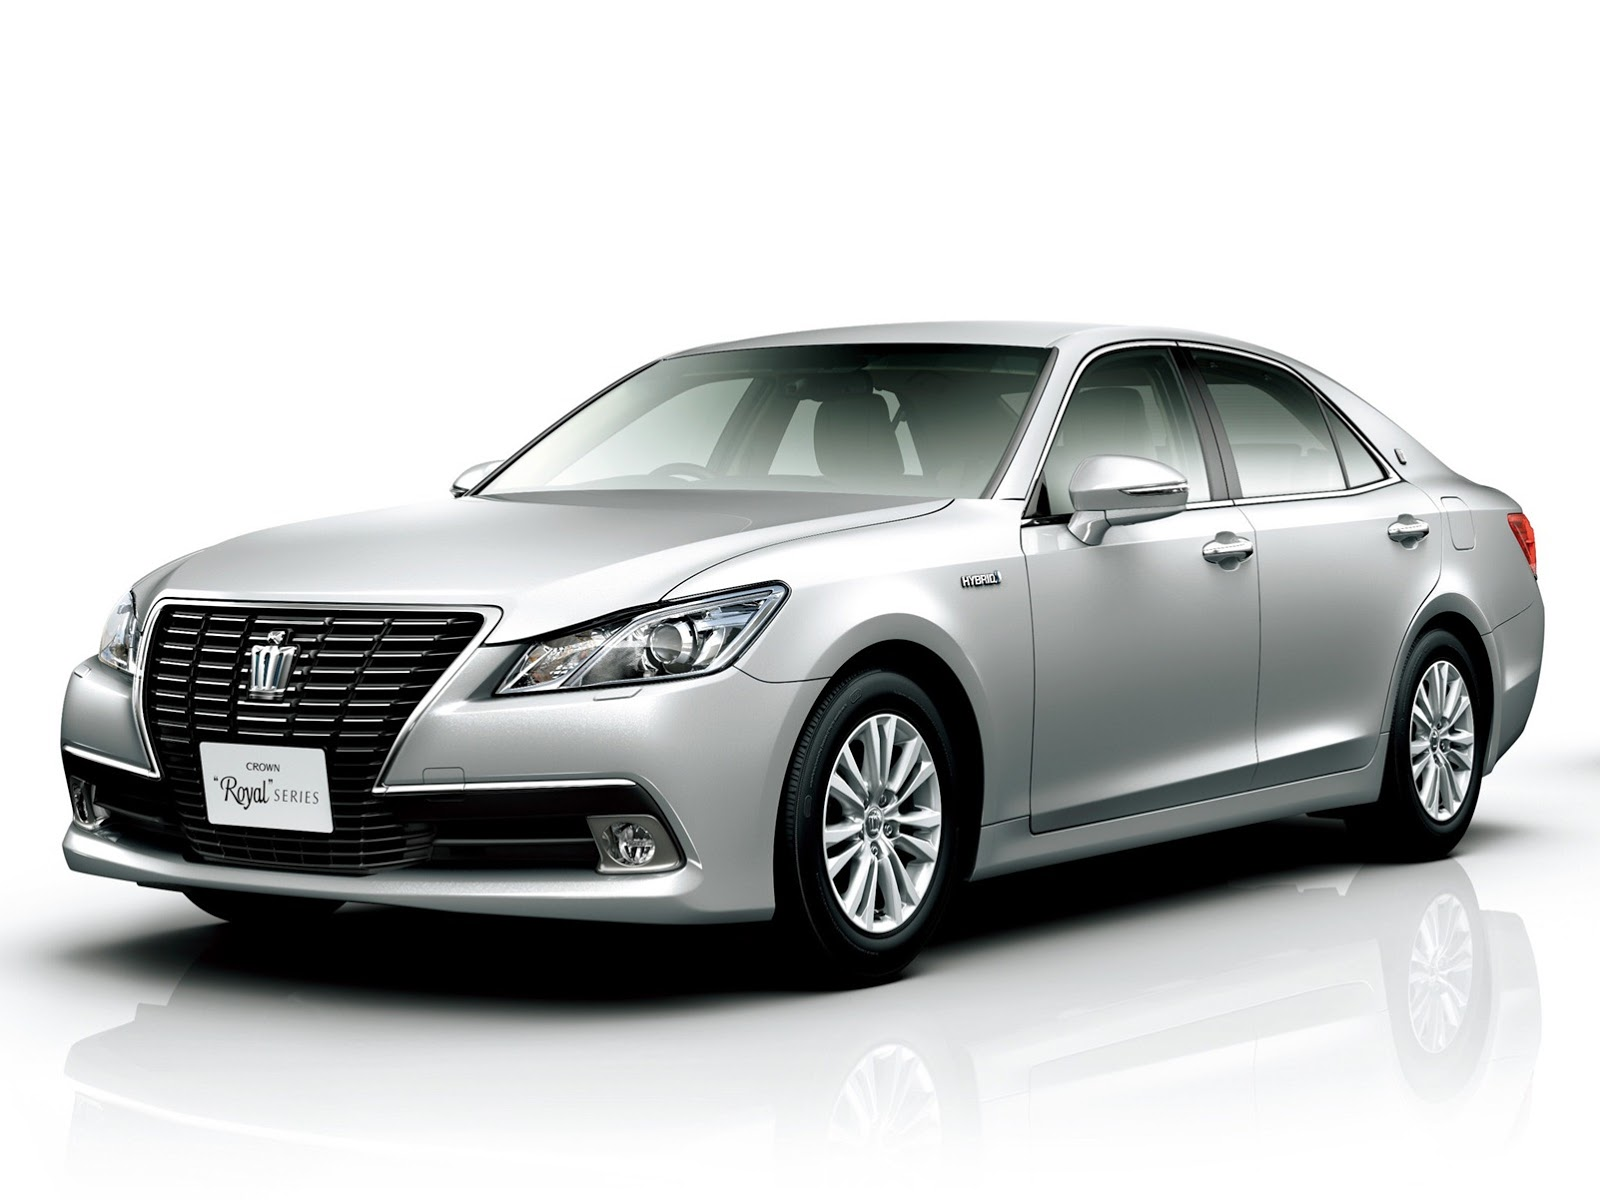 Toyota Crown Majesta VI (S210) 2013 - now Sedan #1